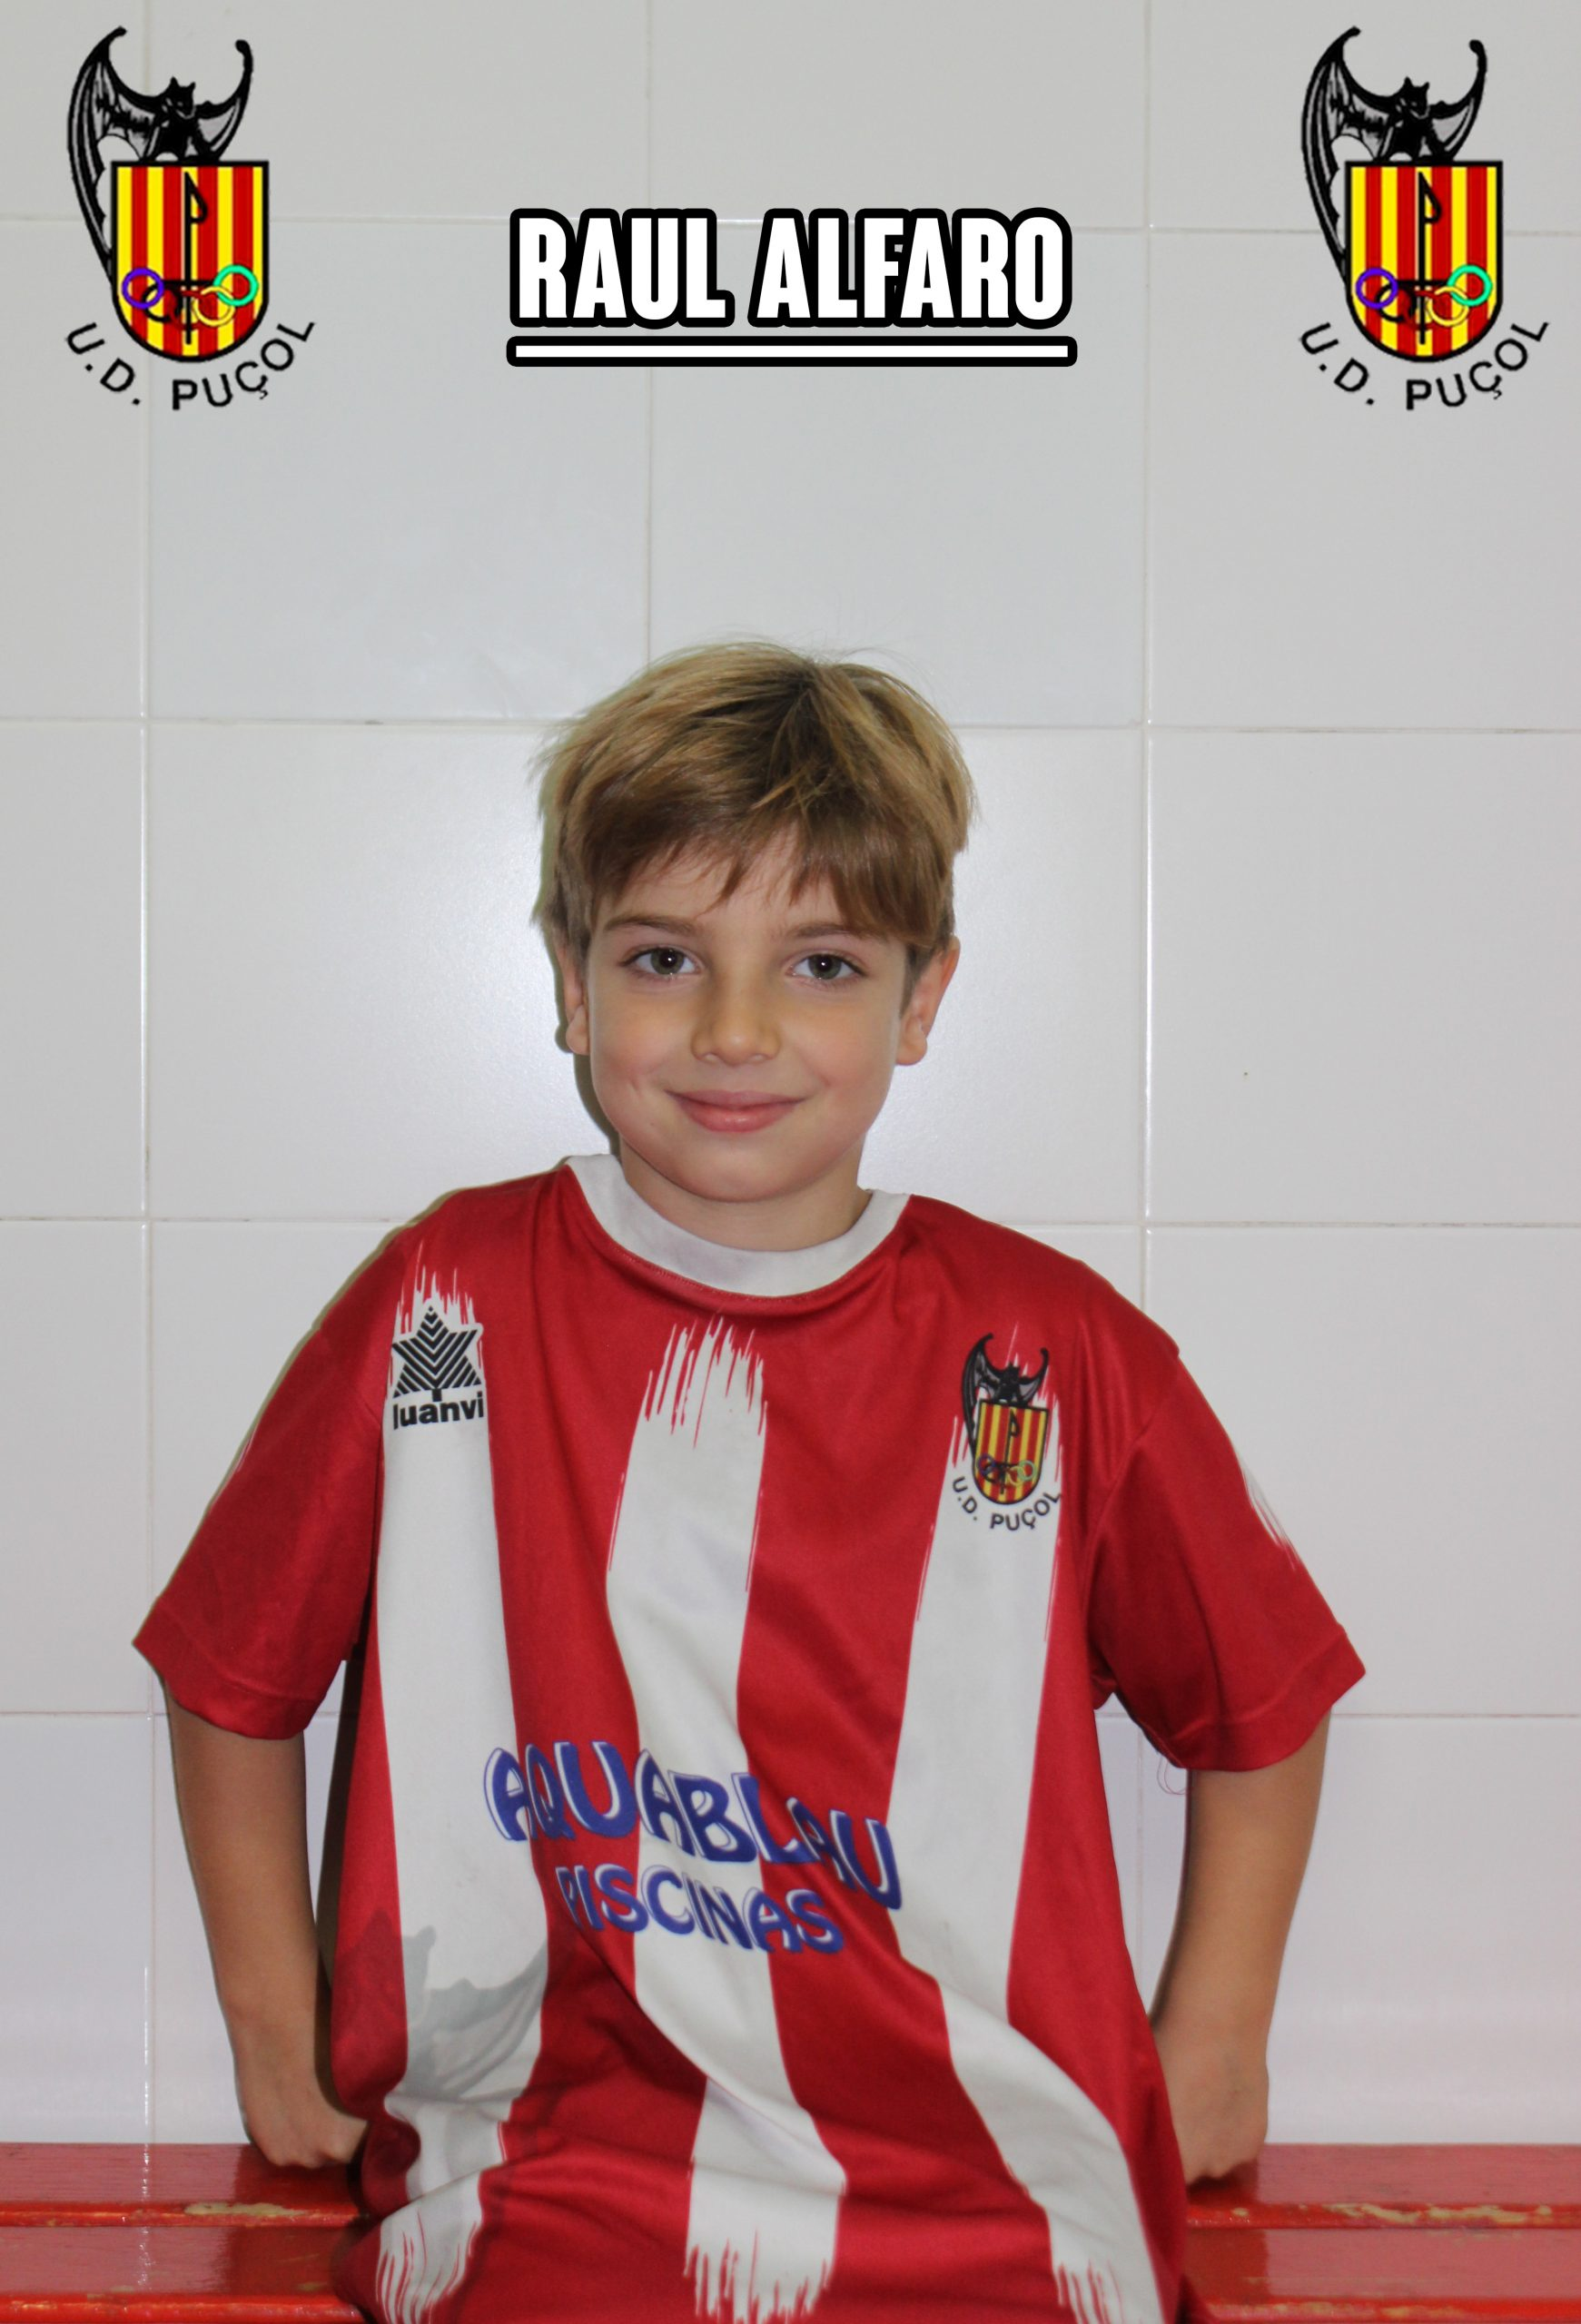 Raul Alfaro